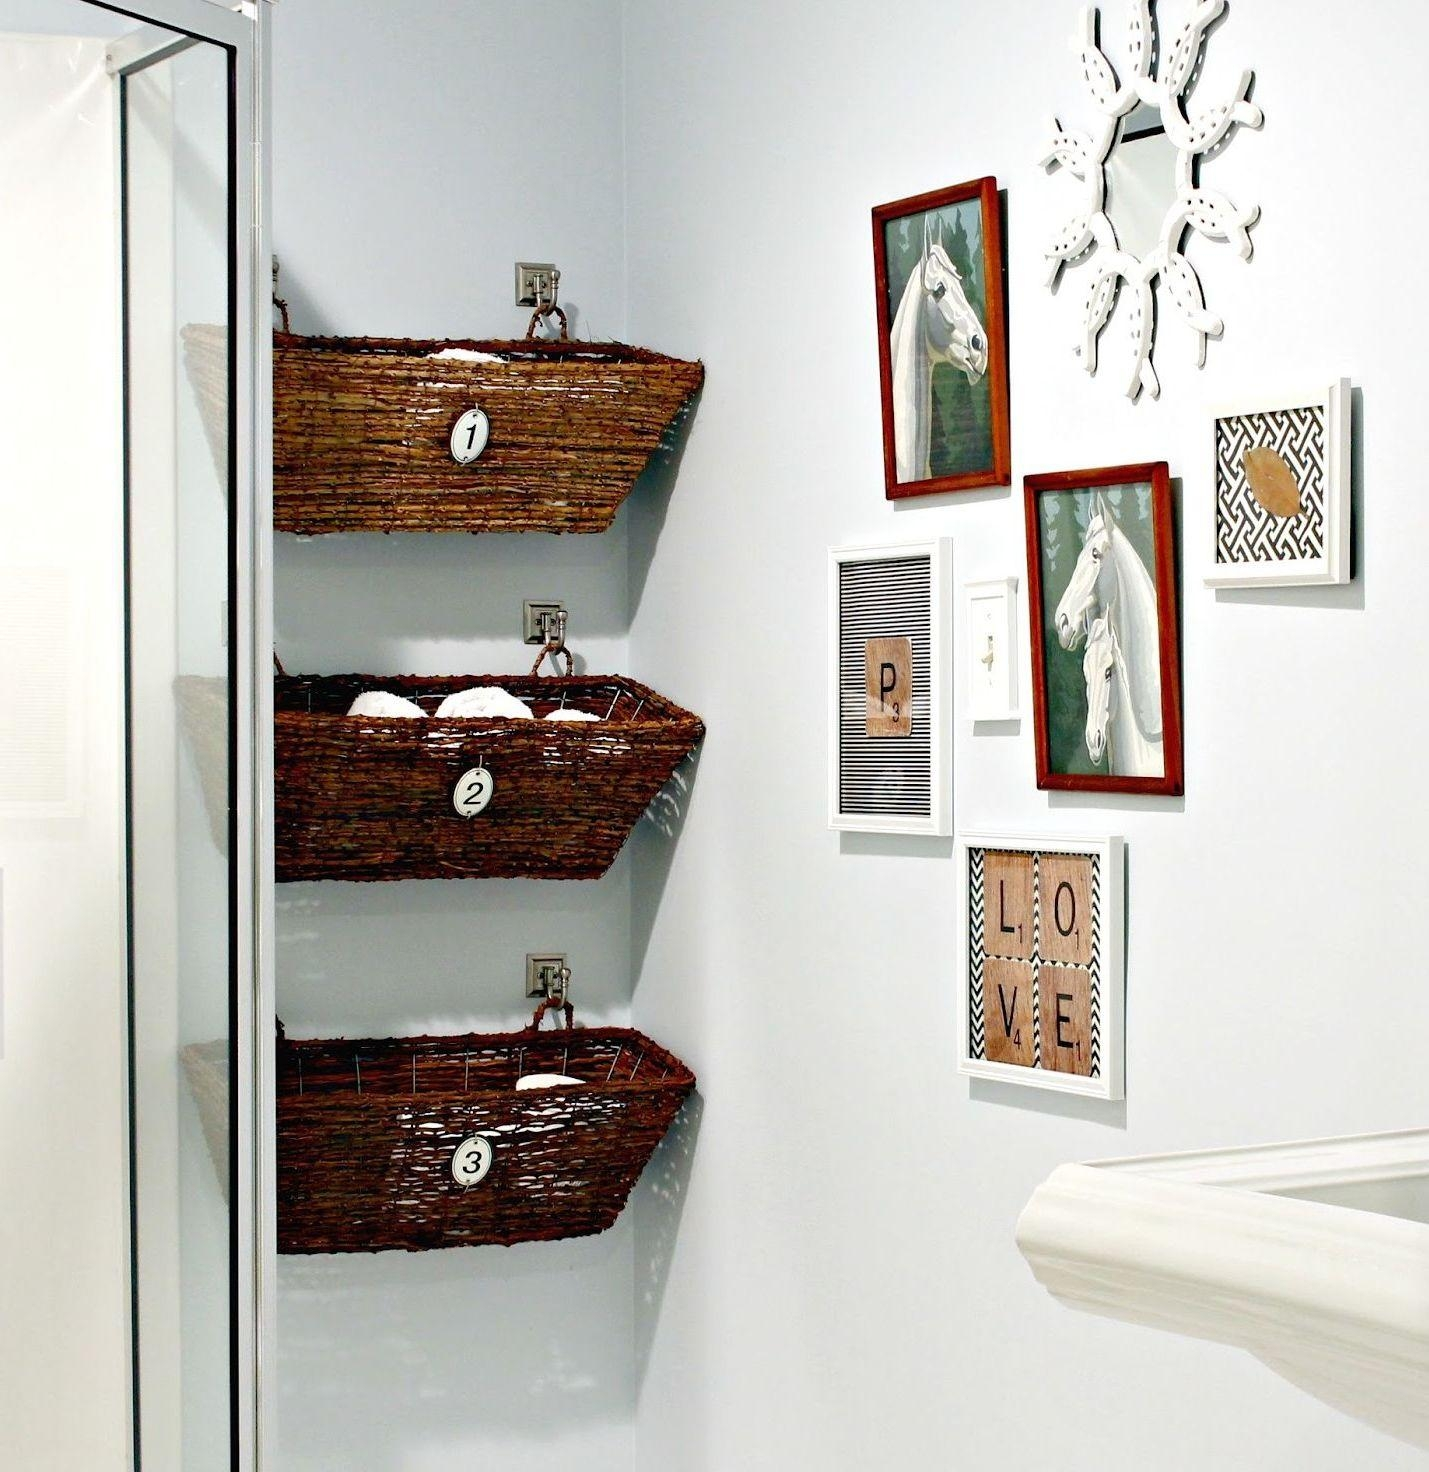 Bathroom Ideas: Small Framed Bathroom Wall Art Near Three Hanging Pertaining To Wall Art For The Bathroom (View 18 of 20)